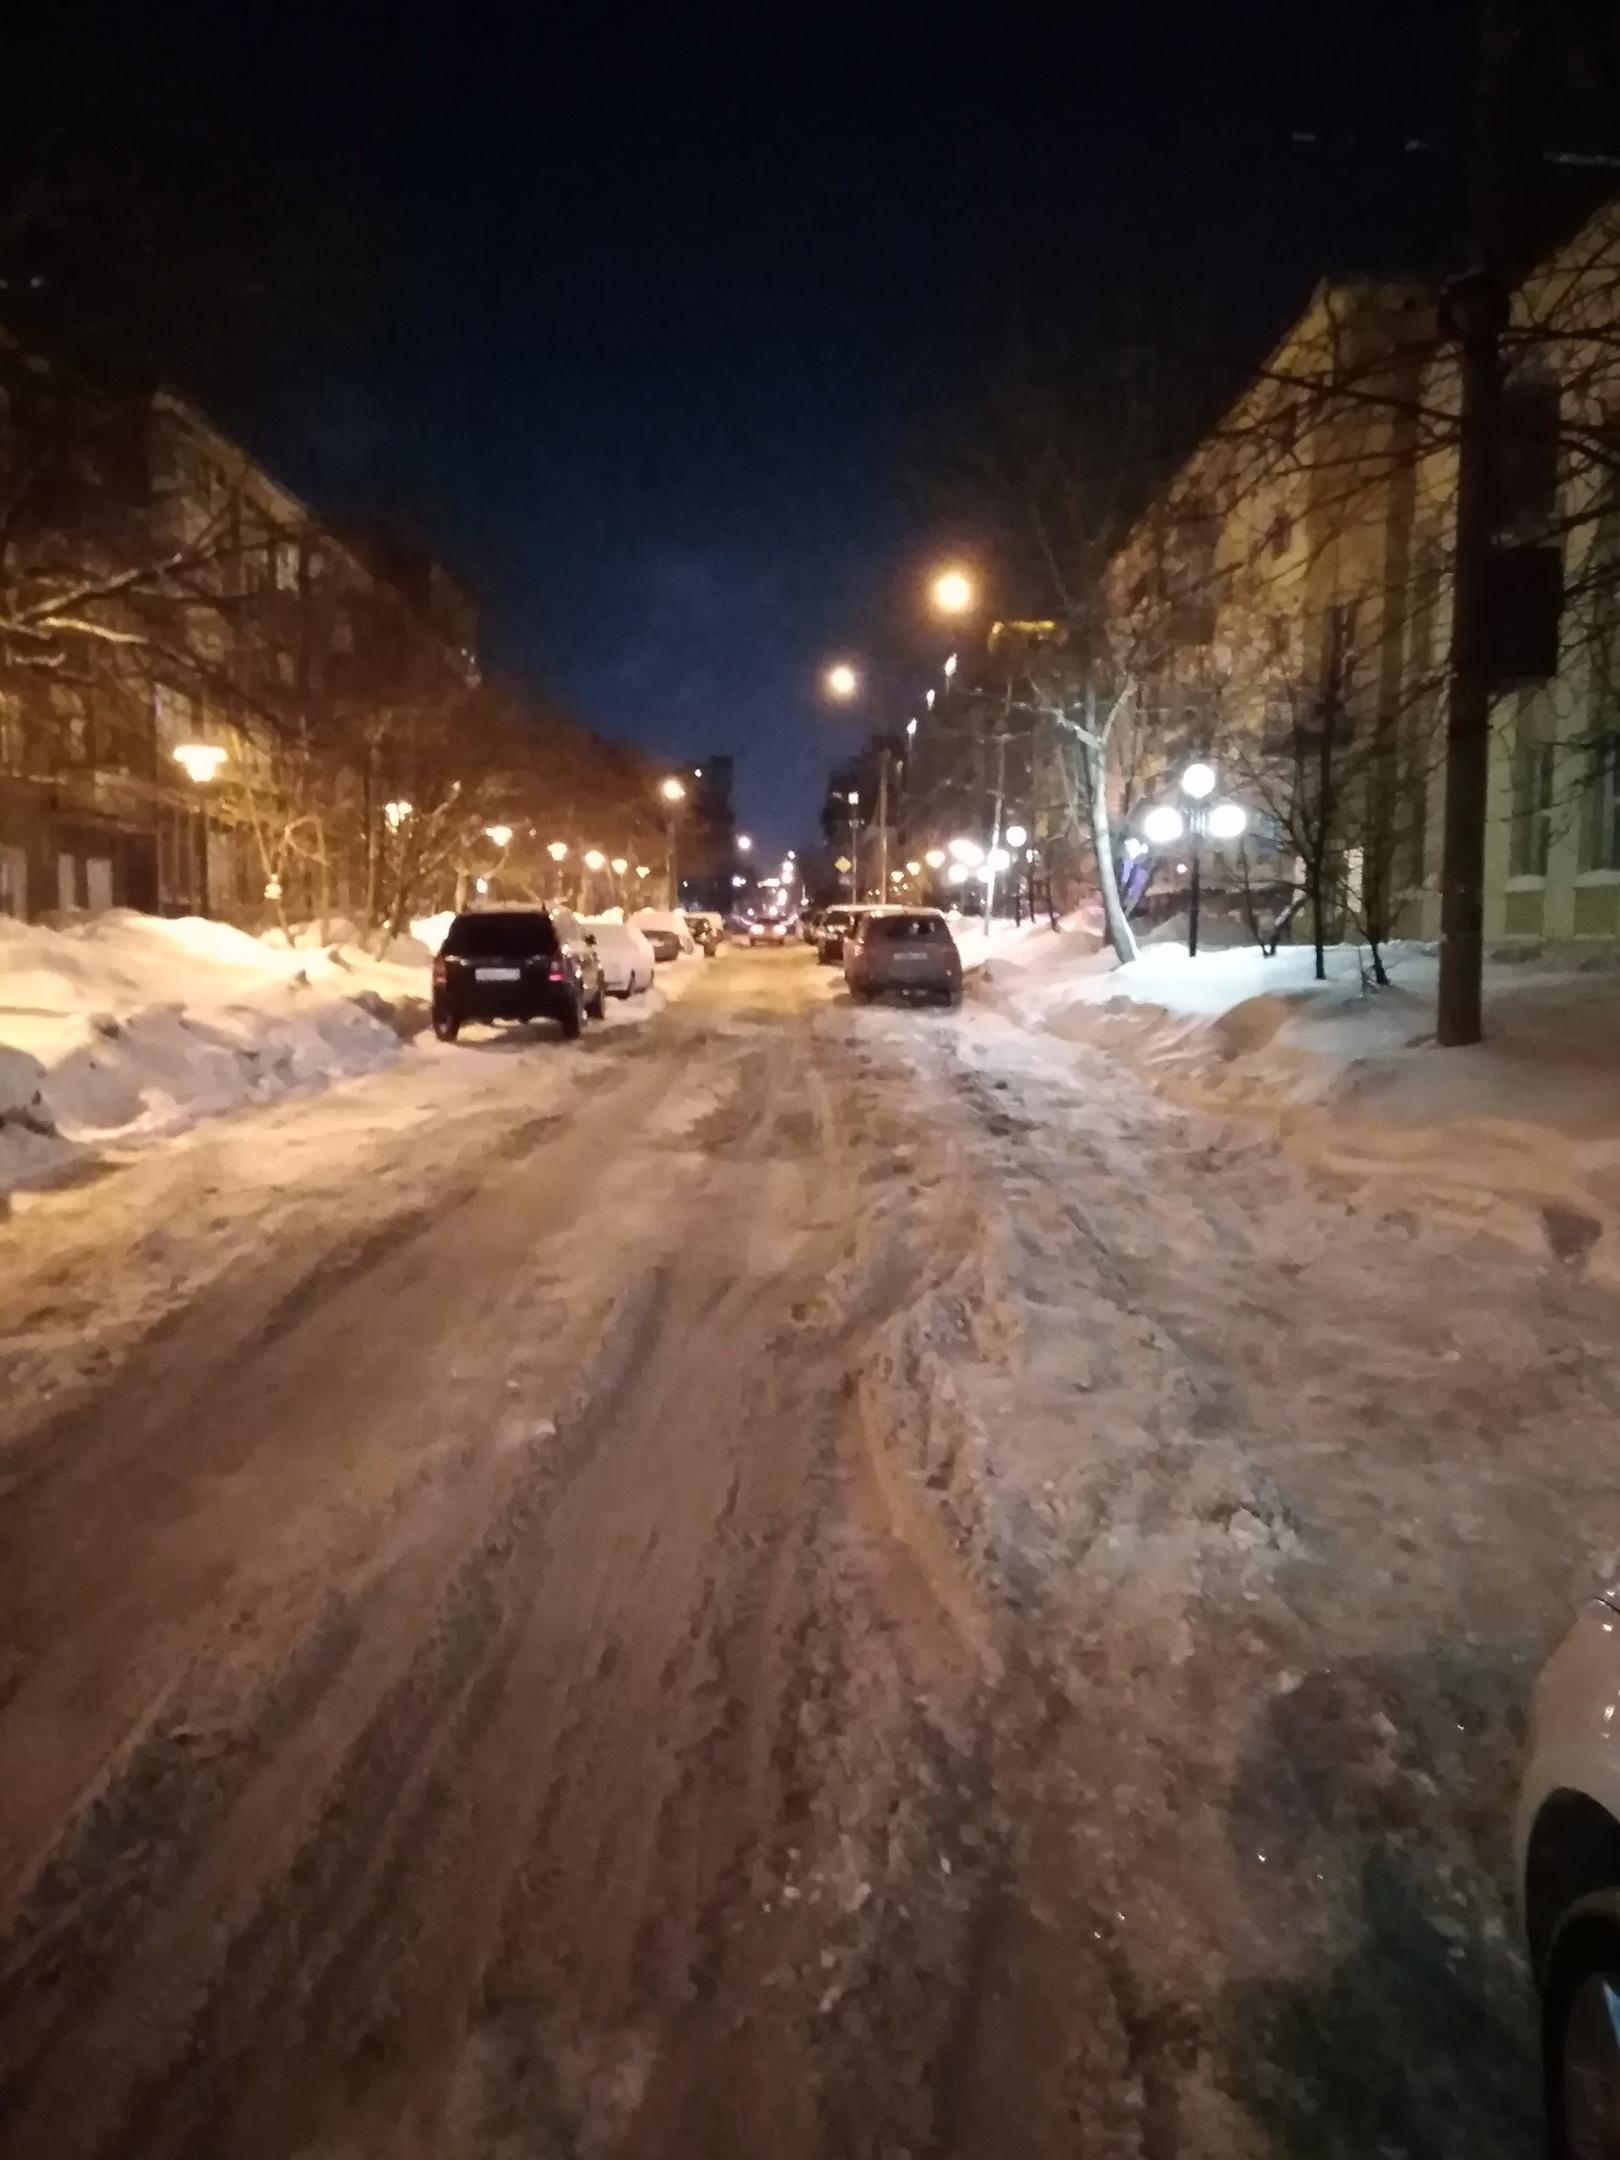 Фото Прокуратура проверит, как с улиц Новосибирска убирают снег 3